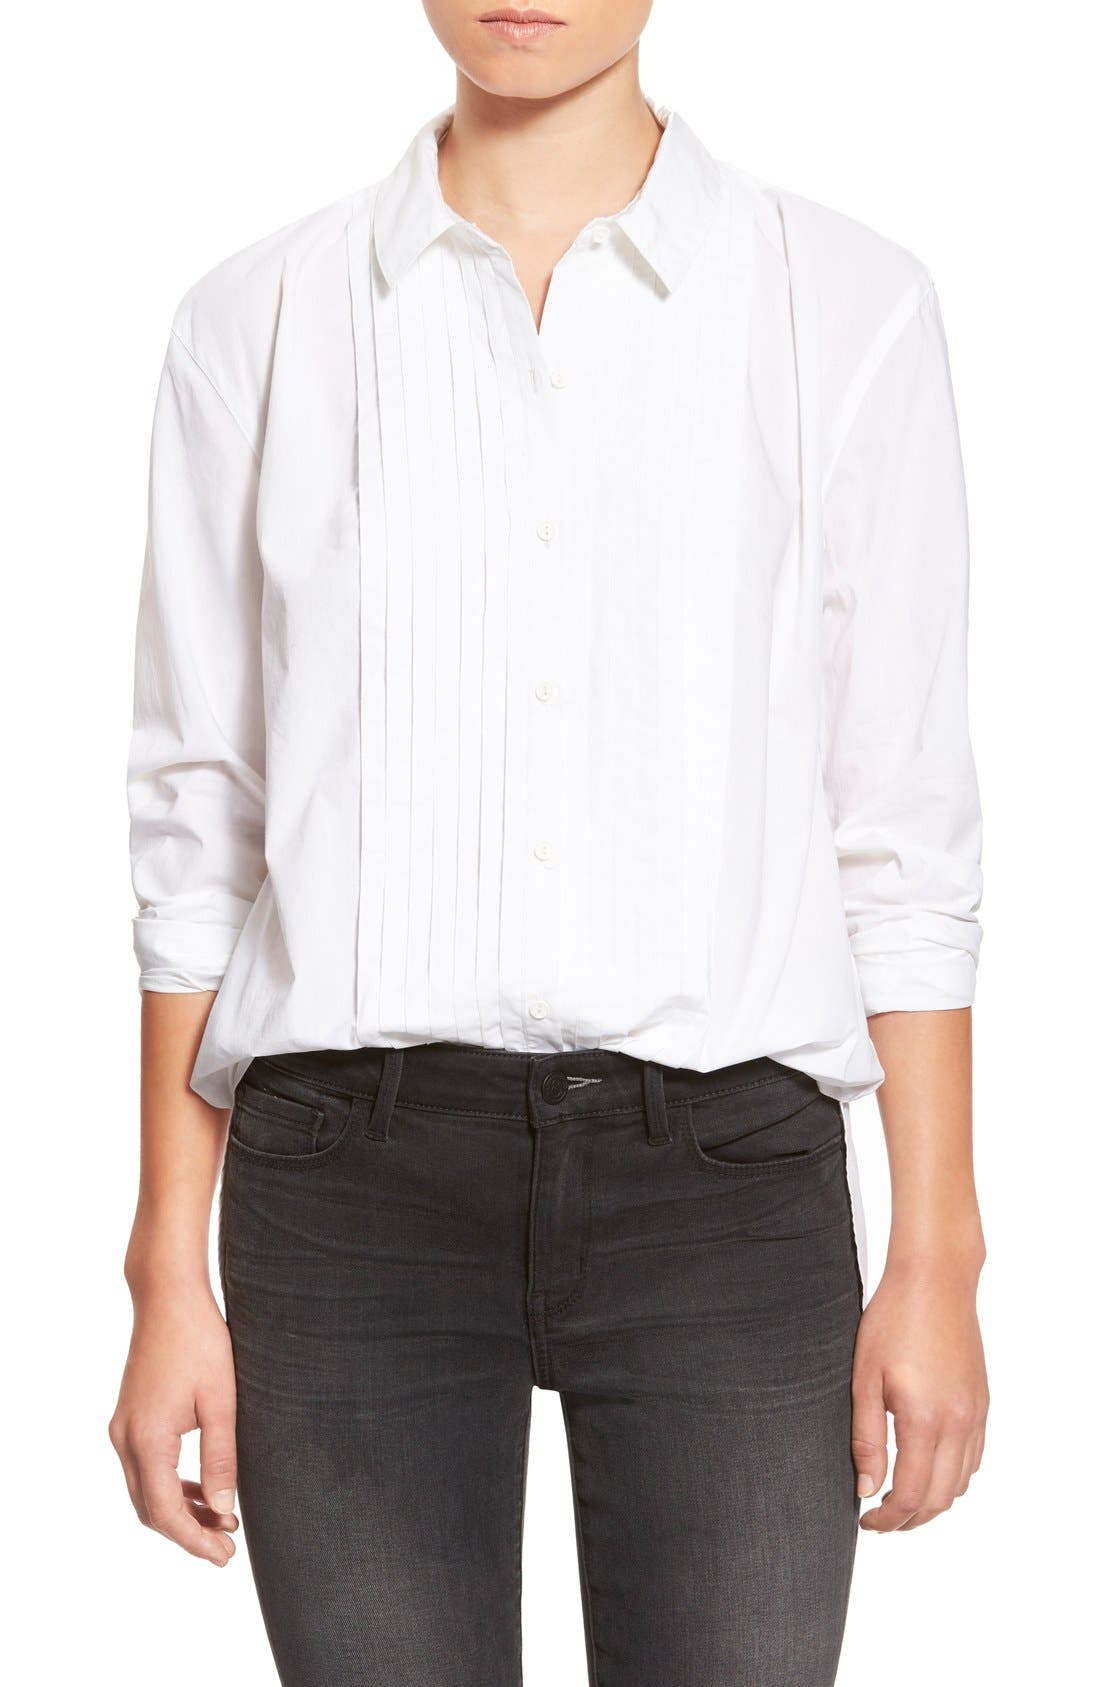 TREASURE & BOND Treasure&Bond Pintuck Pleat Boyfriend Shirt, Main, color, 100